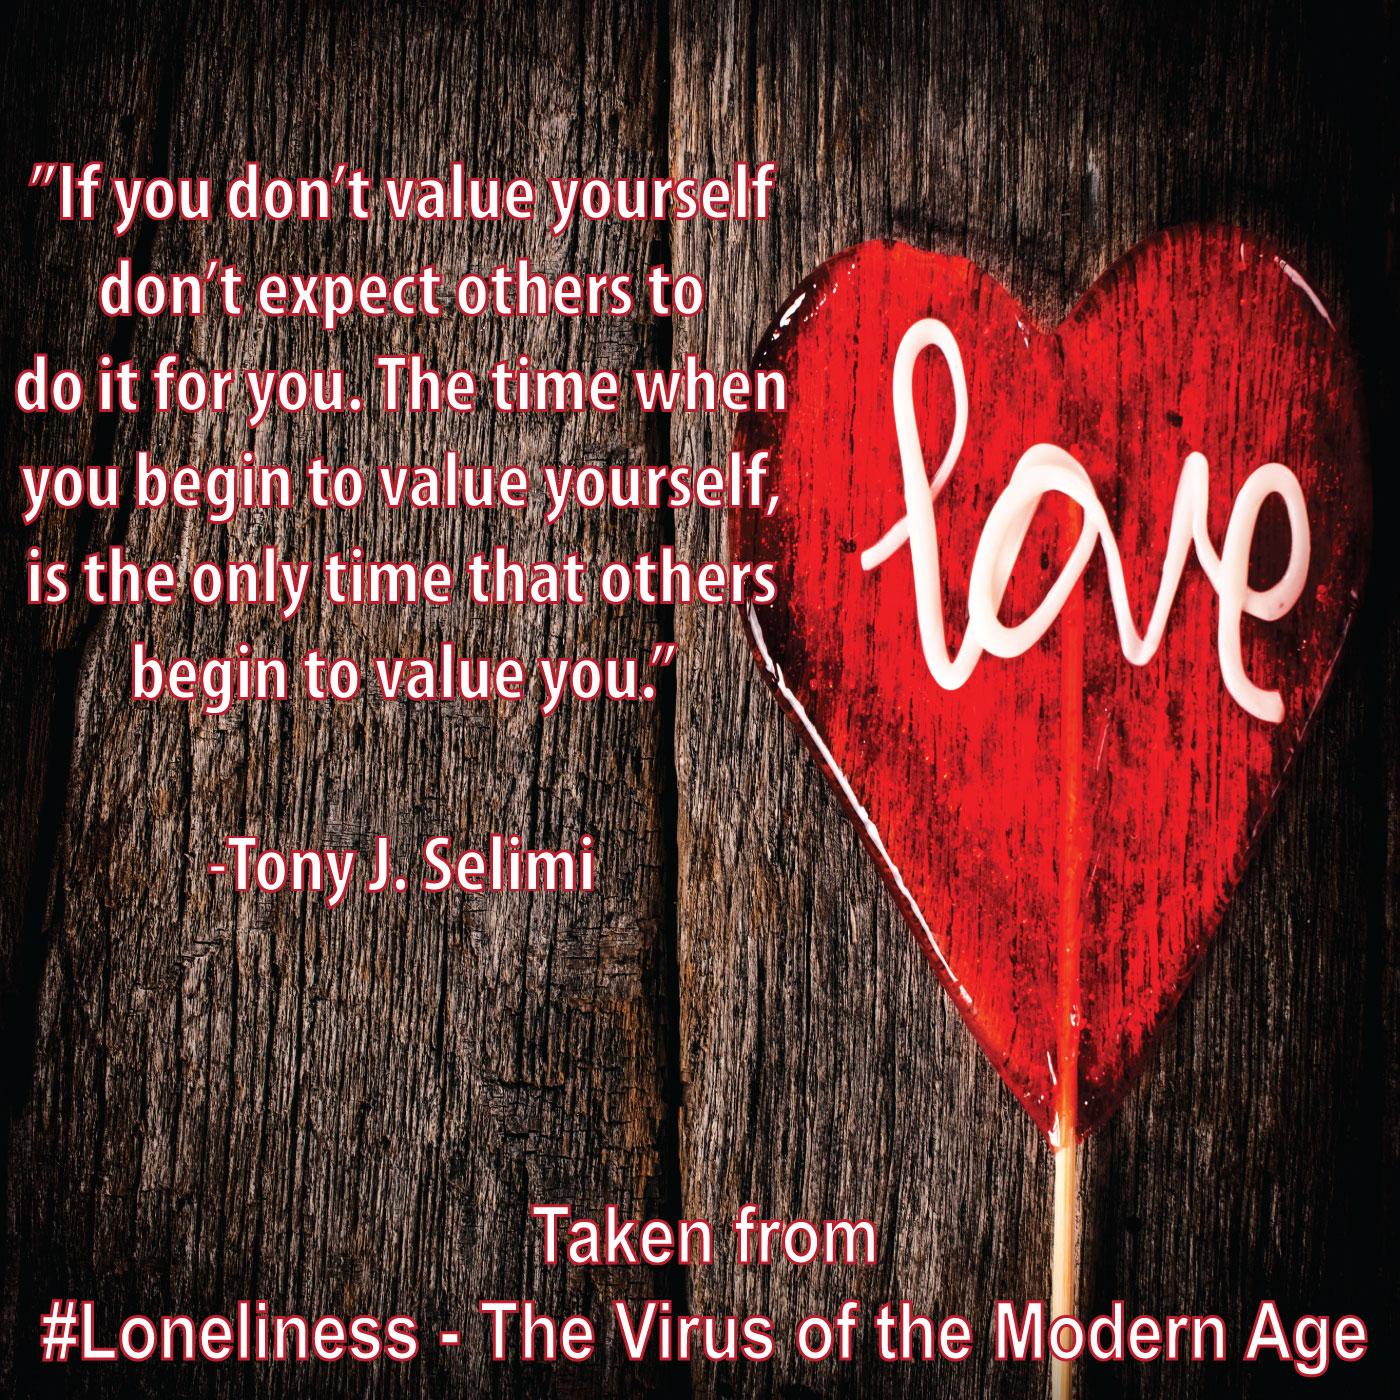 Value-by-Tony-J-Selimi